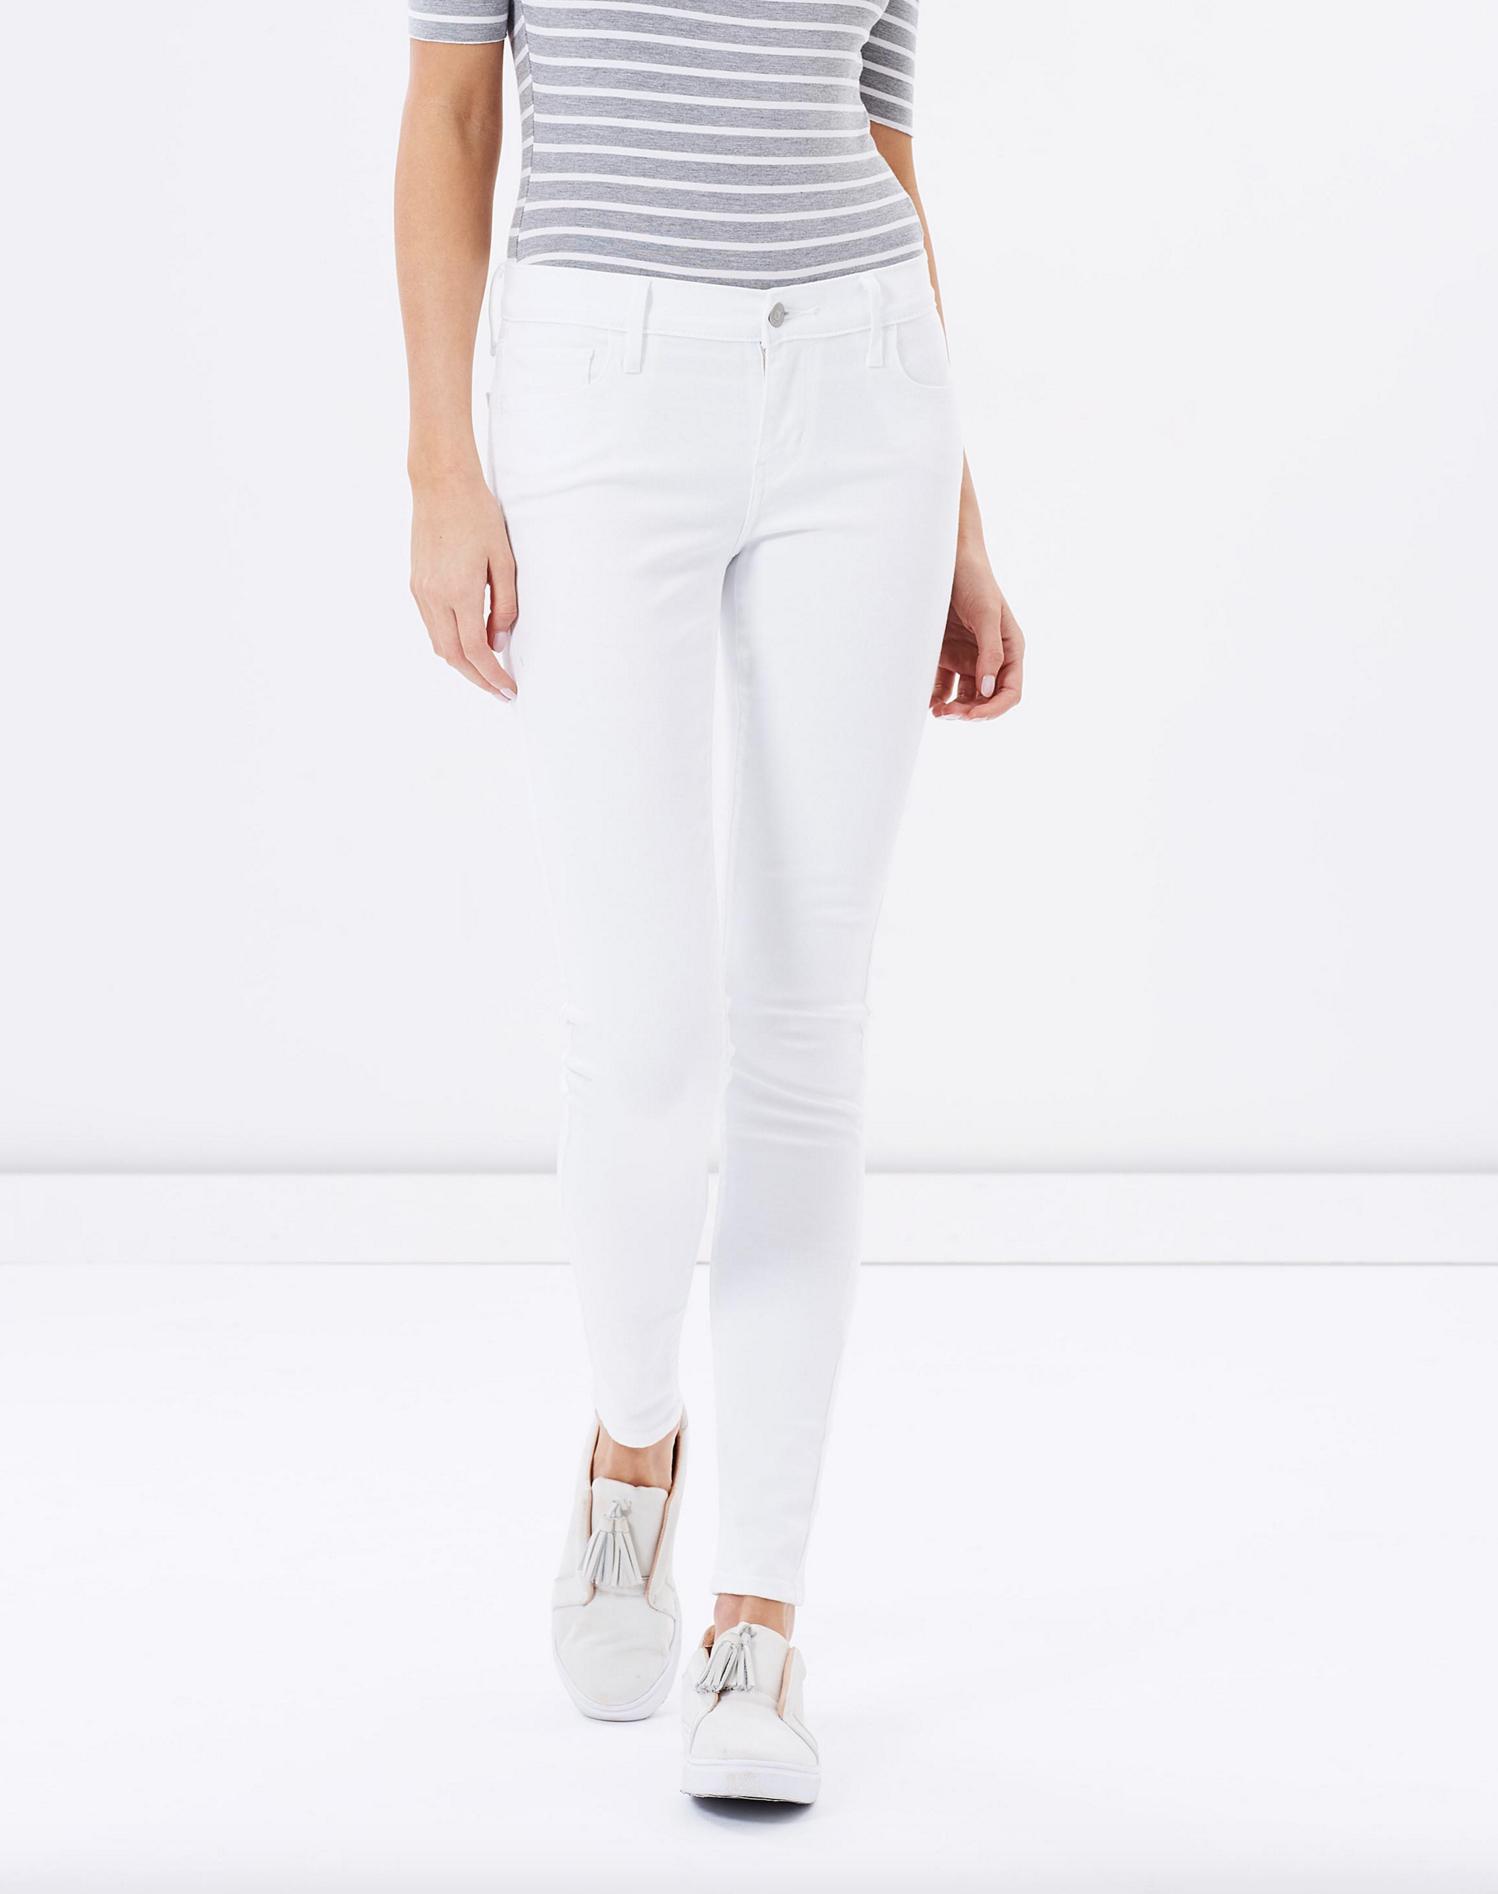 Levis 710  super skinny bright jeans $129.95